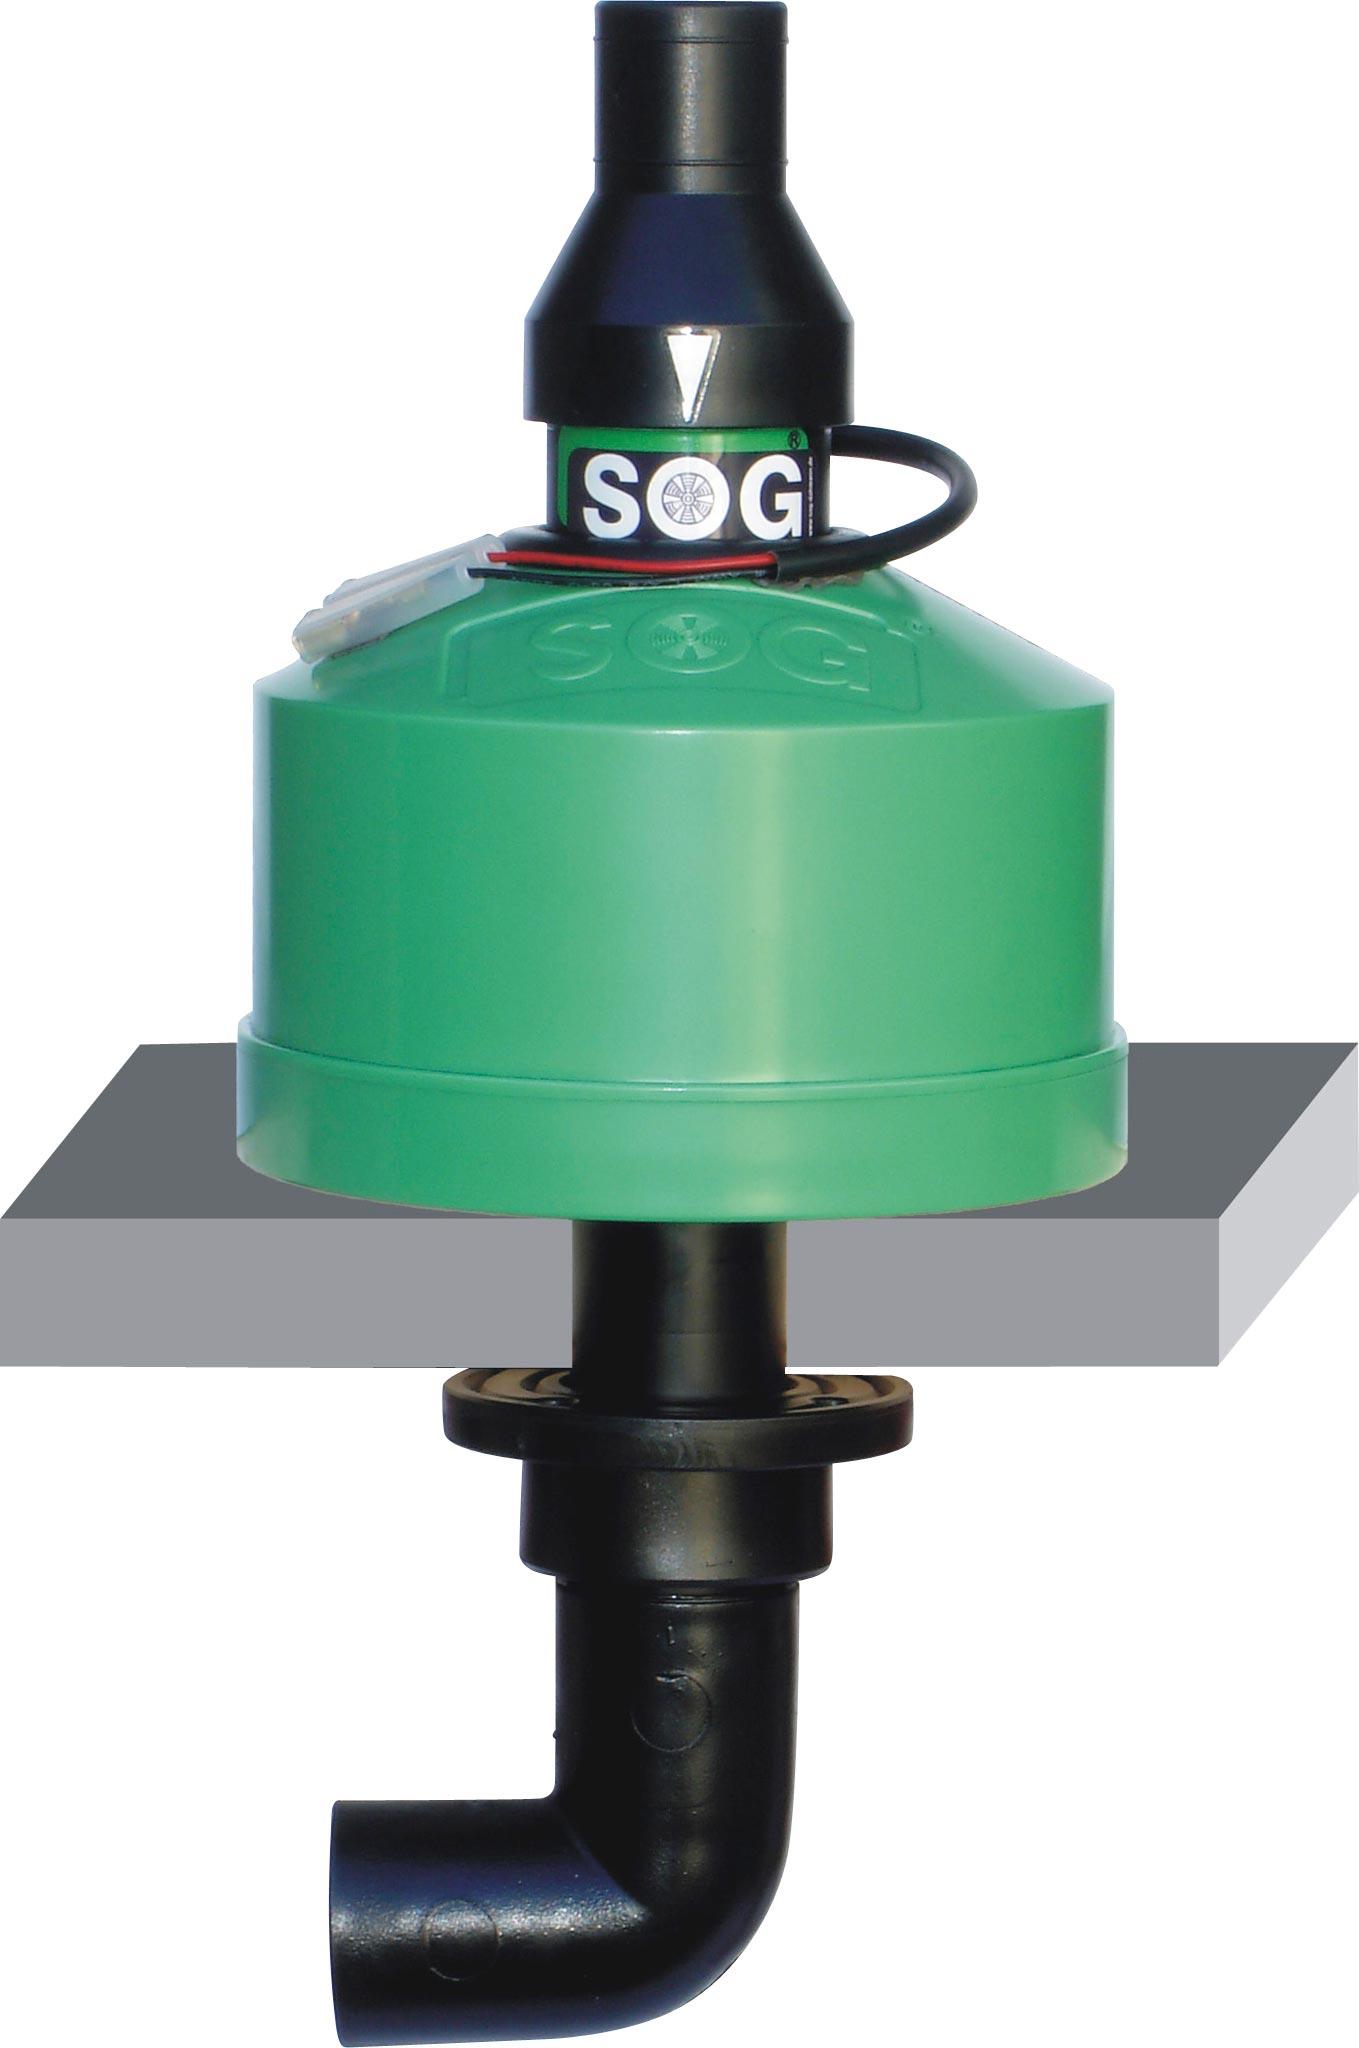 SOG II 12V Toilettenentlüftung Bodenvariante | 04260350440062